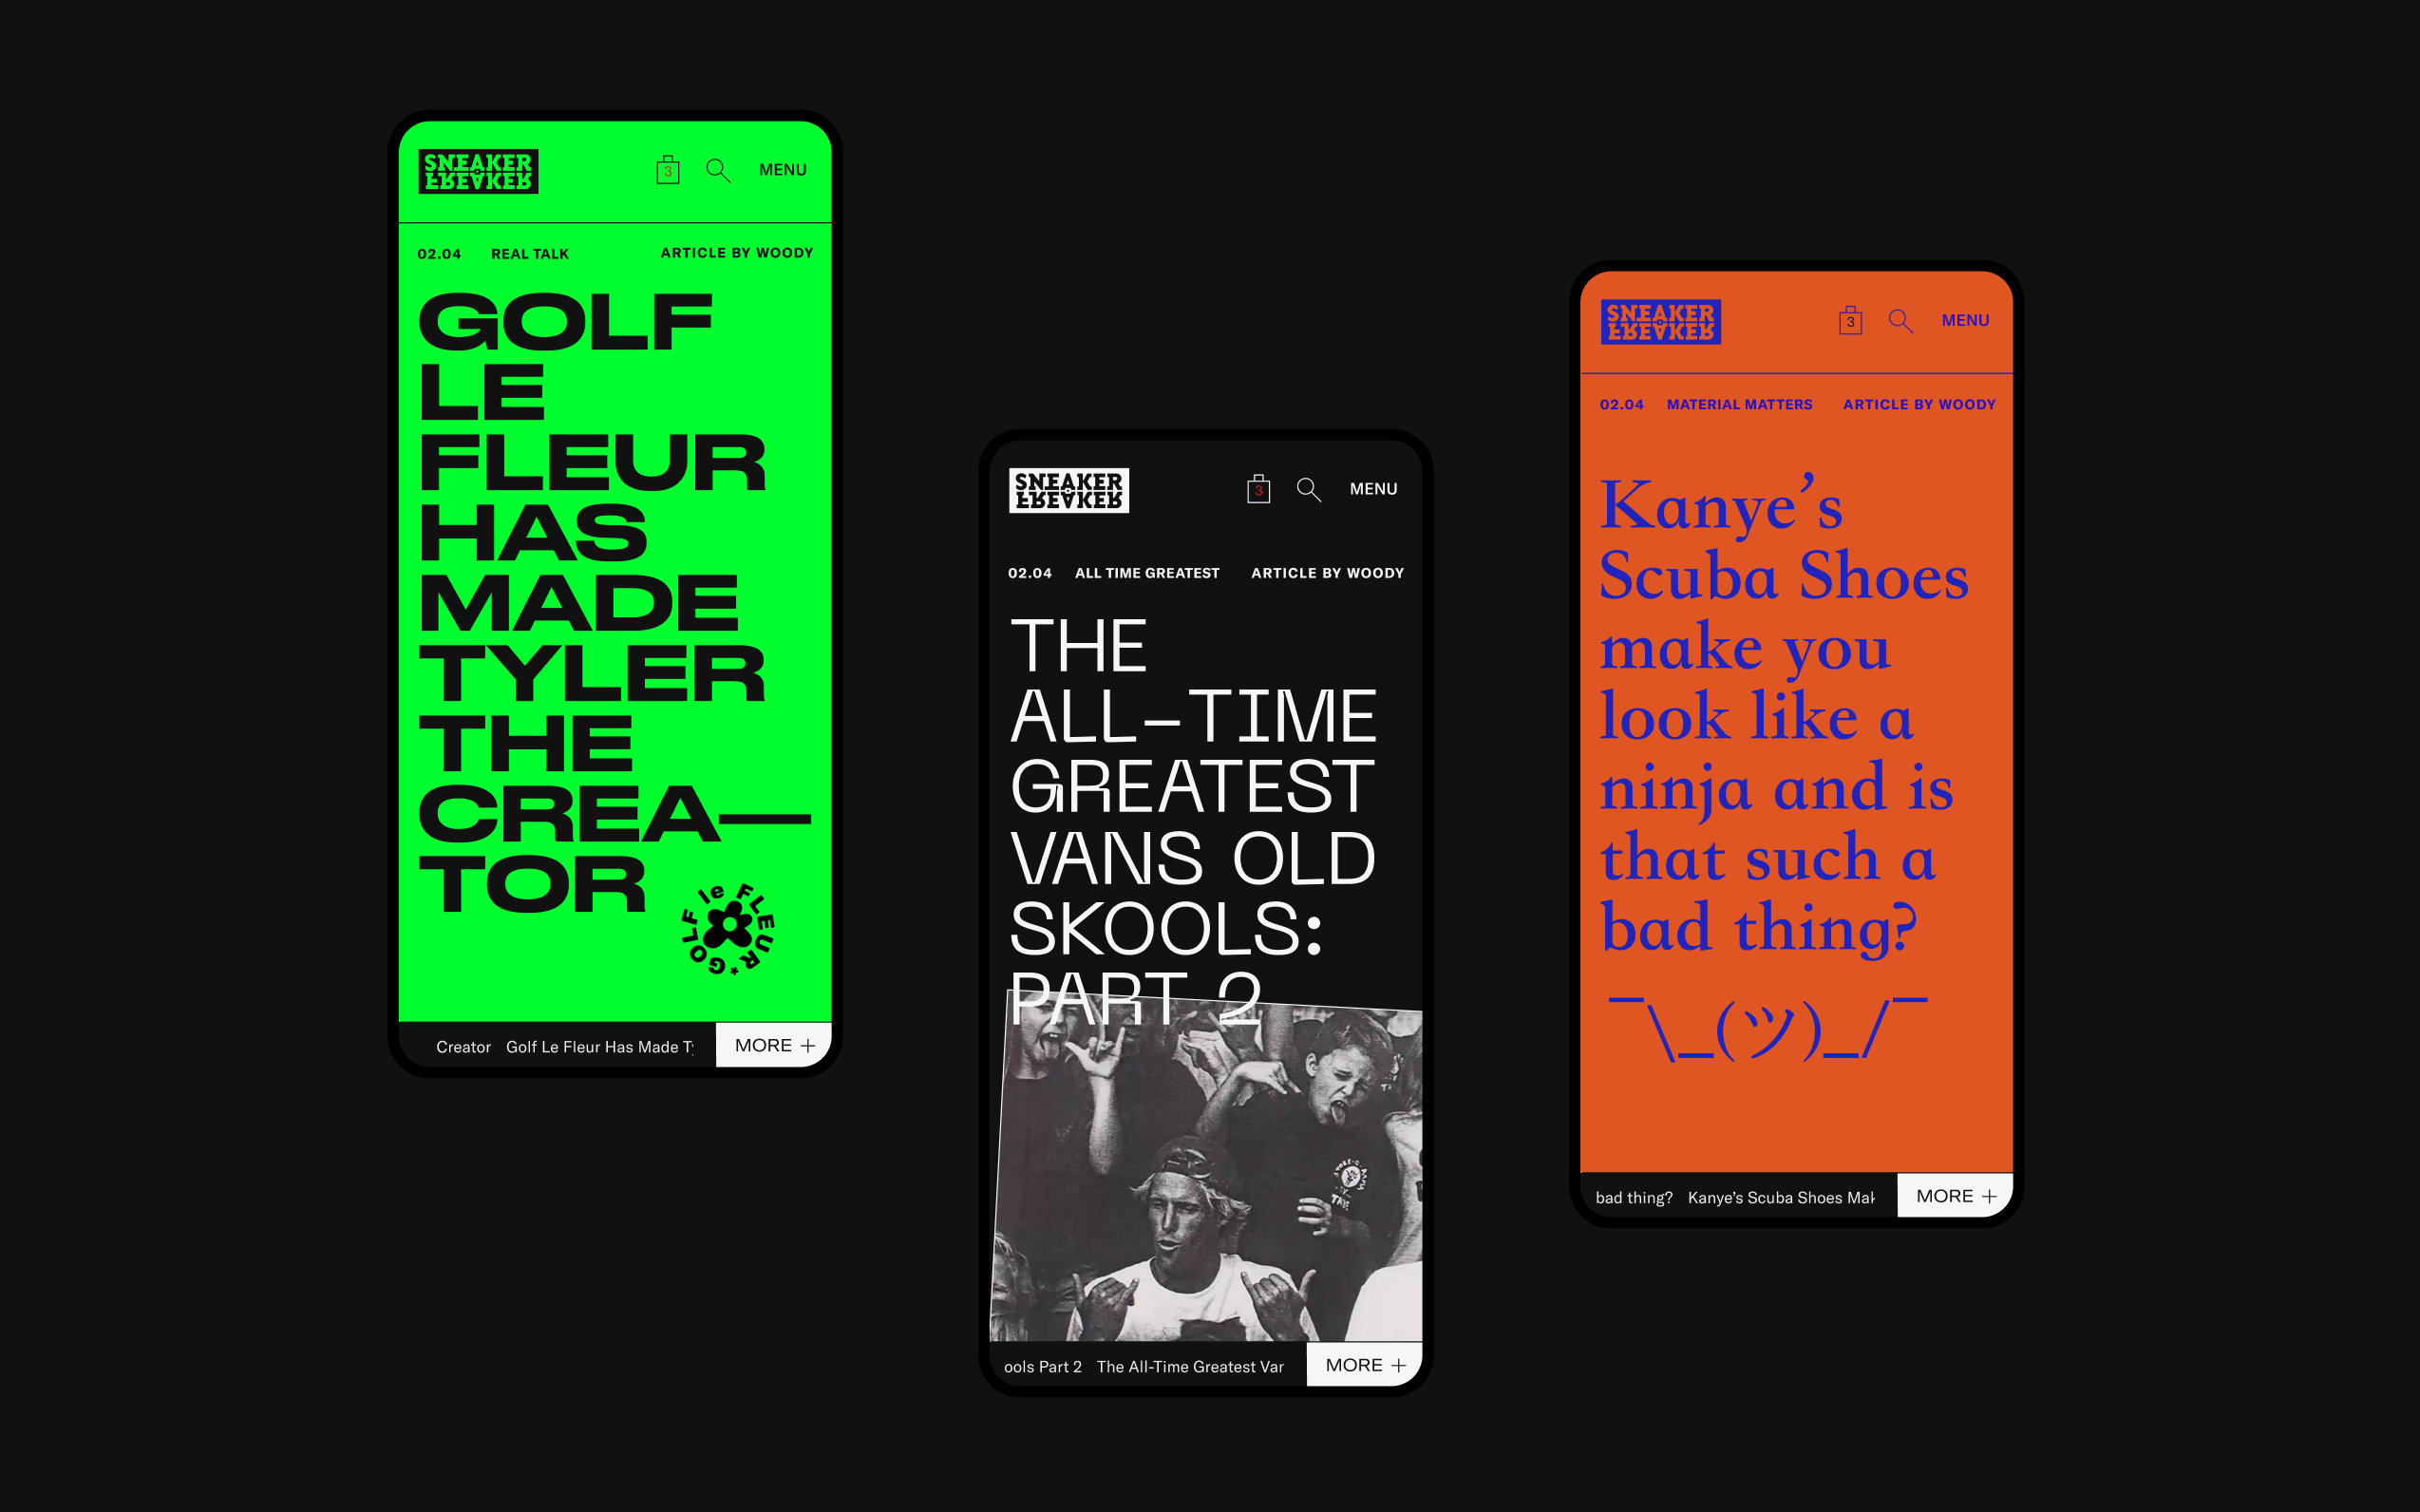 Three mobile screens showing variations of sneaker freaker article hero's